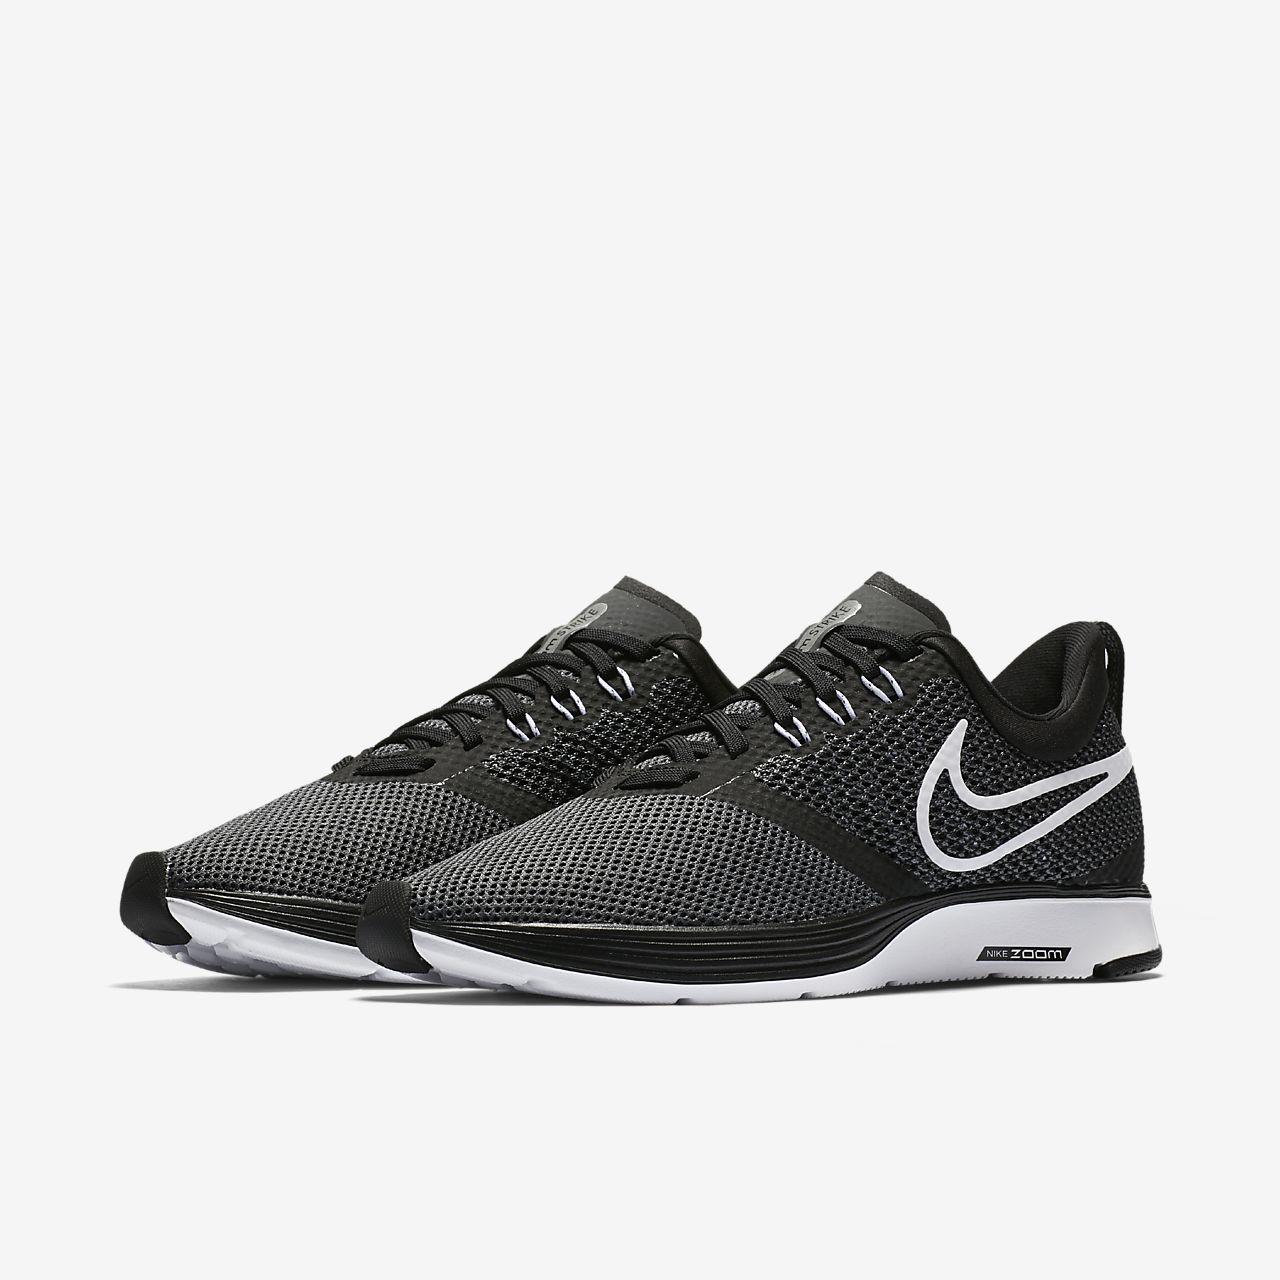 quality design 61869 9ed5c Nike Zoom Strike Womens Running Shoe